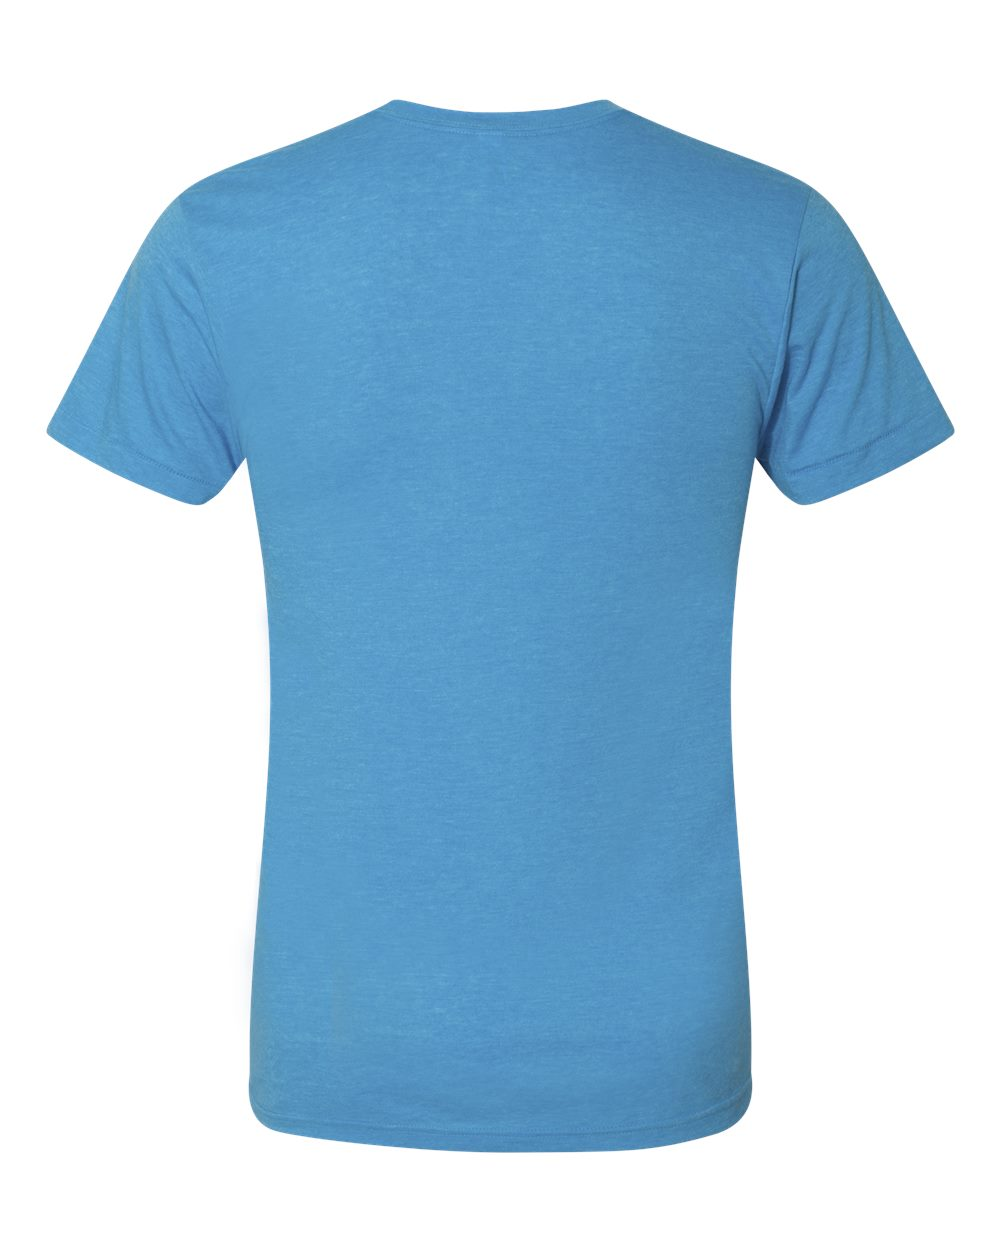 American-Apparel-Mens-Slim-Fit-50-50-Cotton-T-Shirt-Tee-BB401W-up-to-2XL thumbnail 46